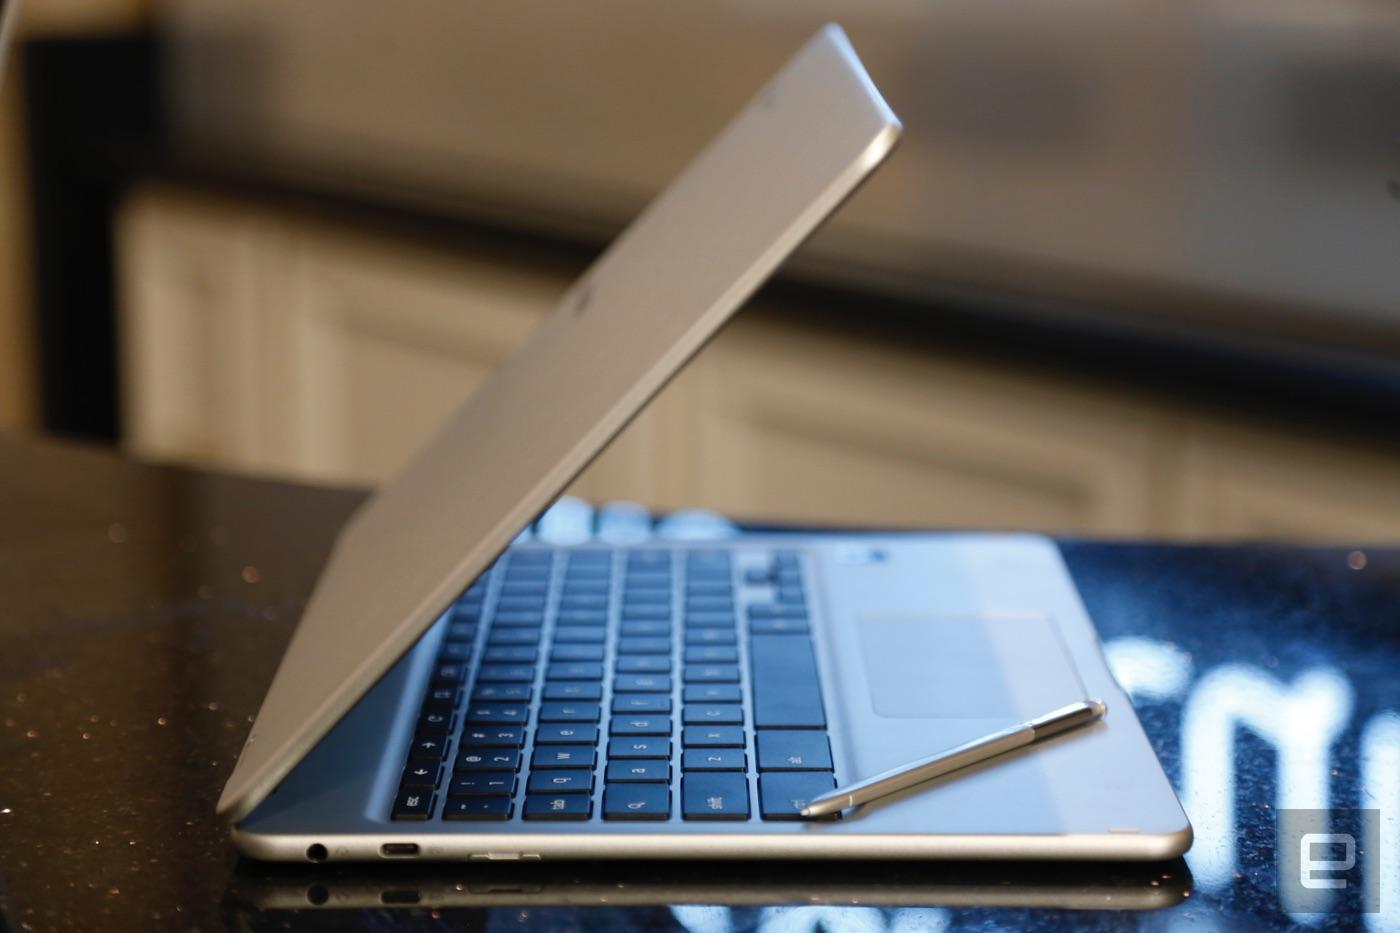 Samsung and Google built their ideal Chromebook